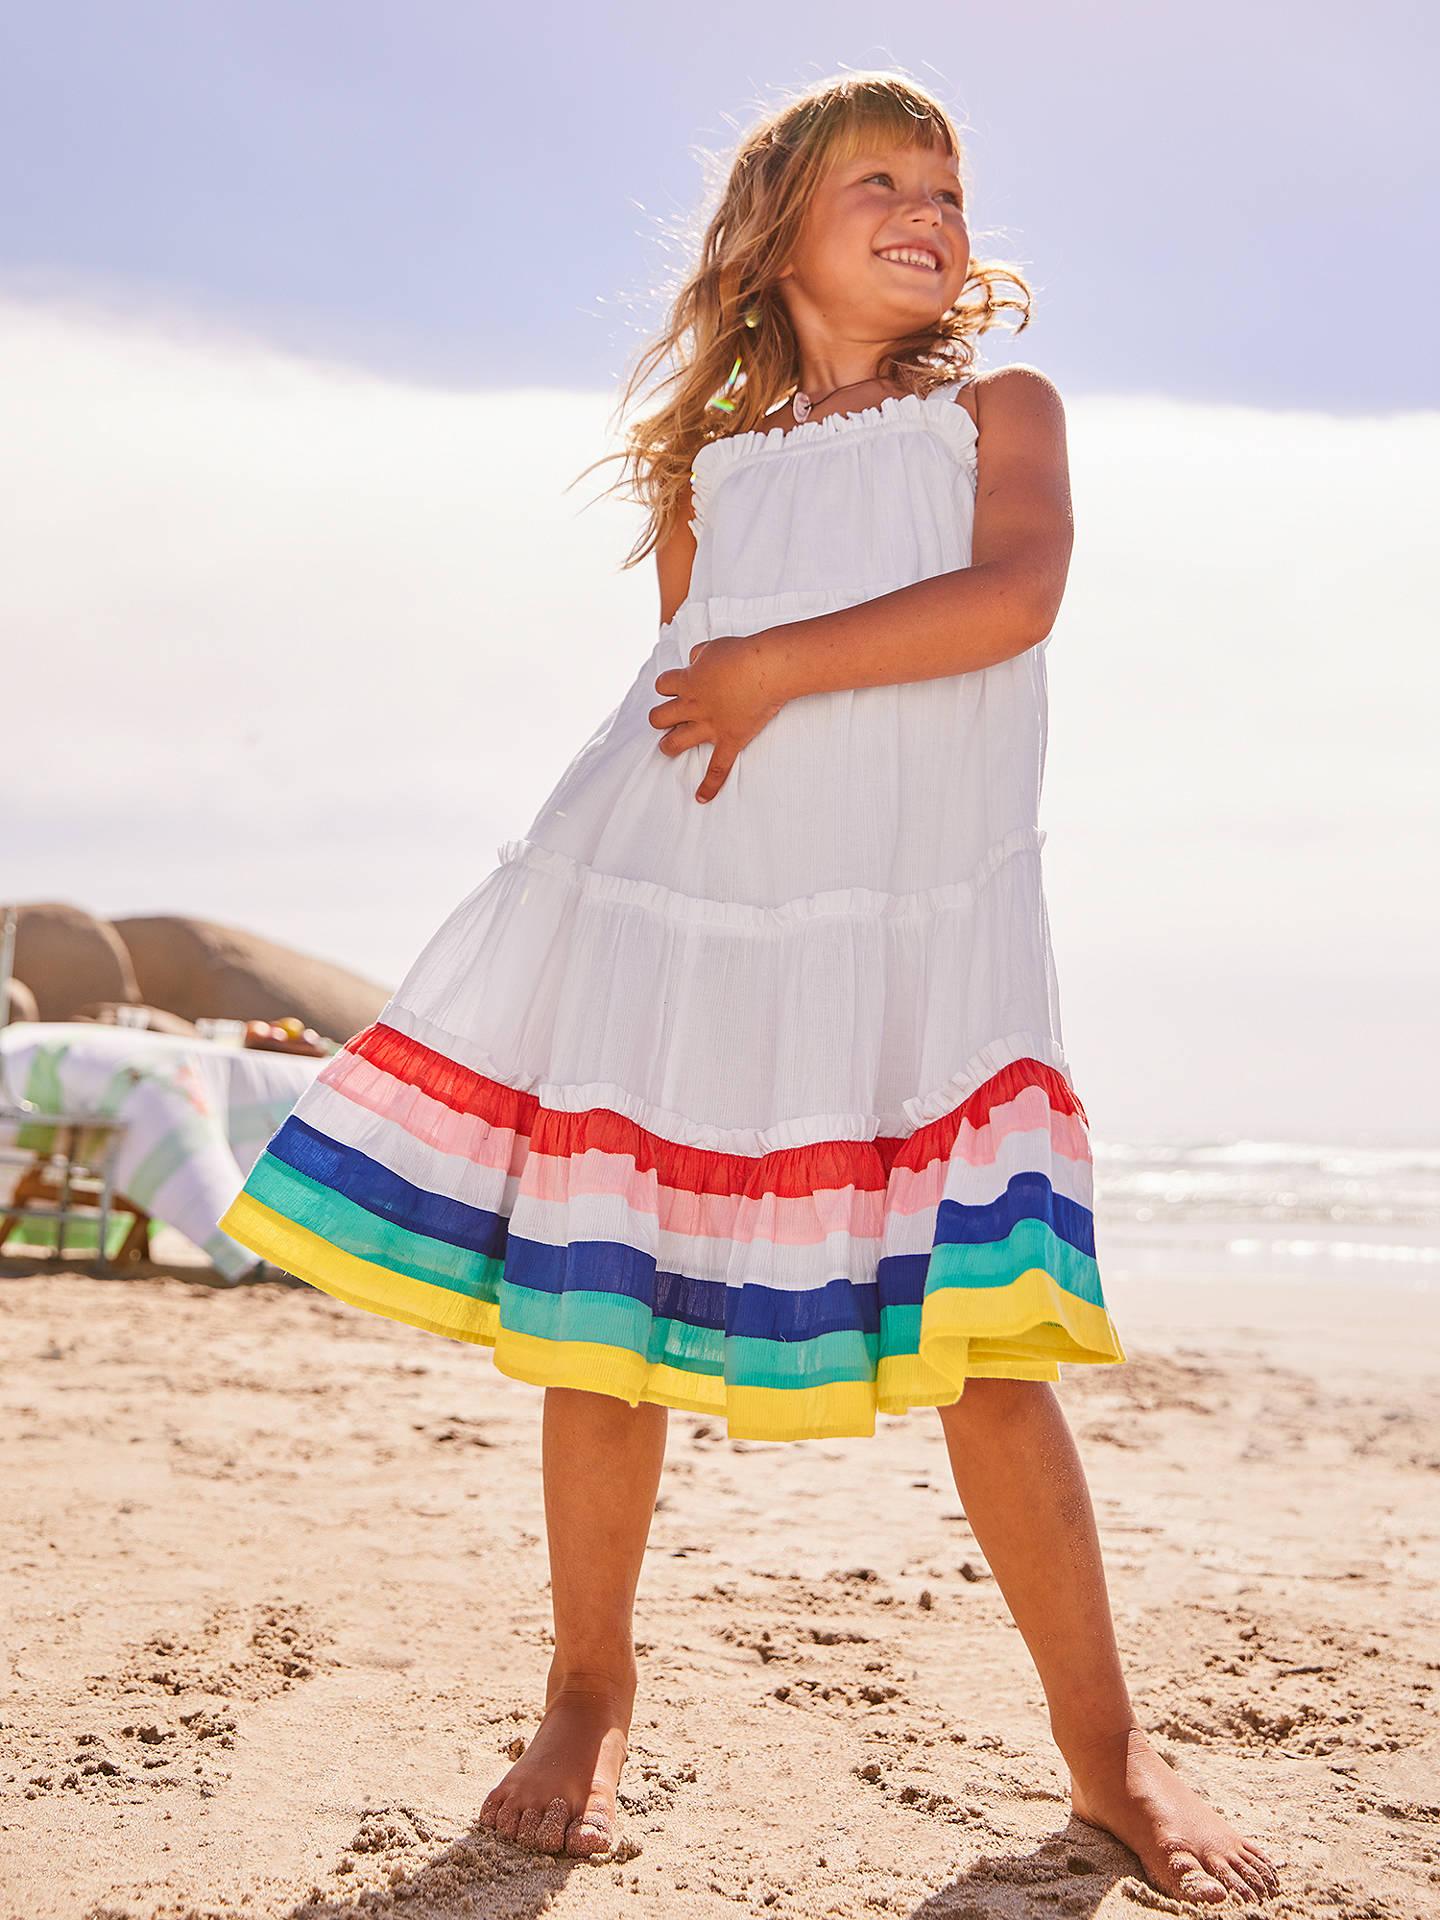 ce5ab98bb40fc Mini Boden Girls' Twirly Dress, White/Rainbow at John Lewis & Partners